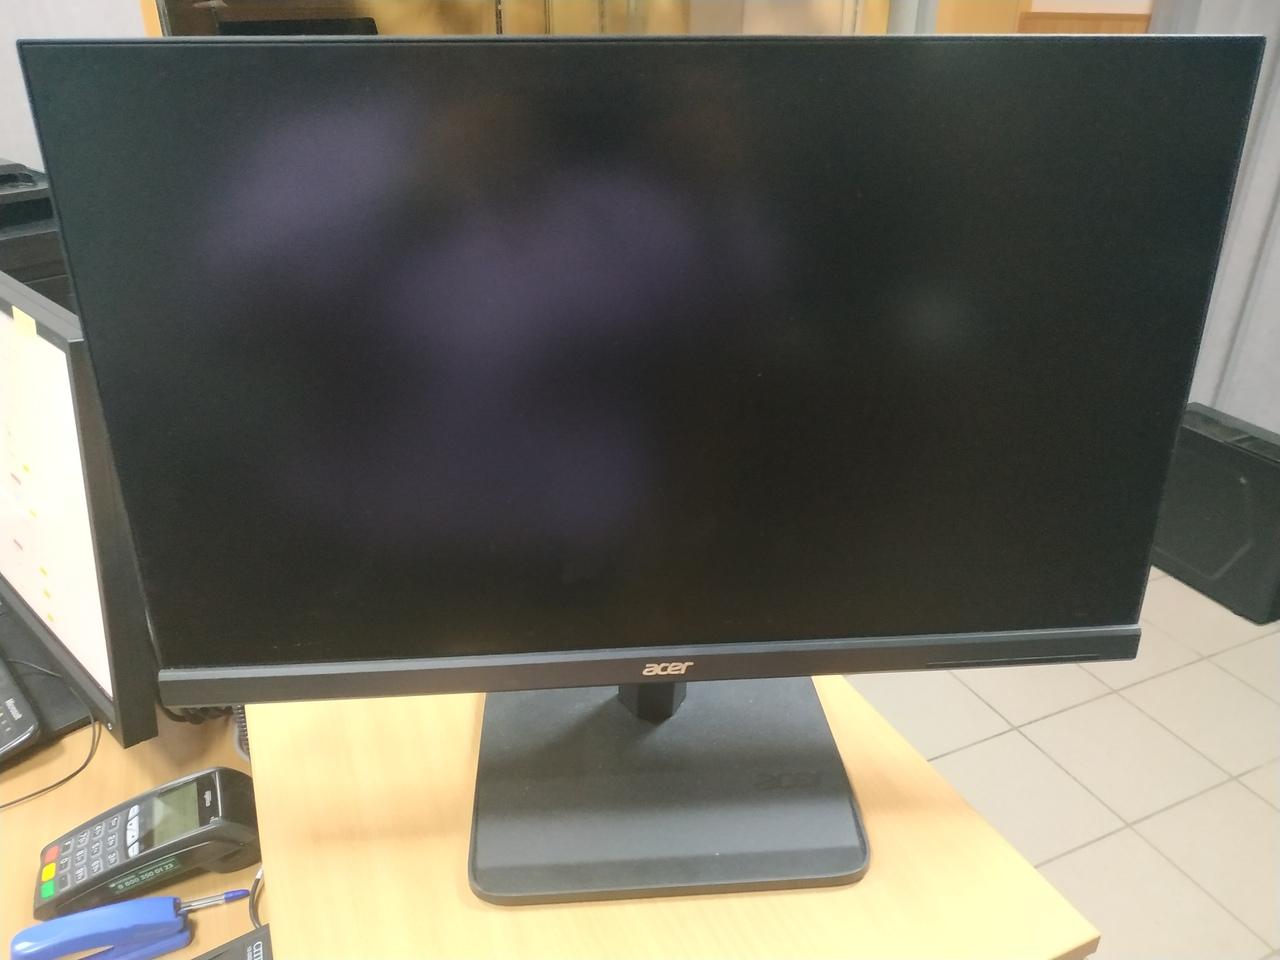 монитор Acer KA241Ybidx | фото 1 из 1